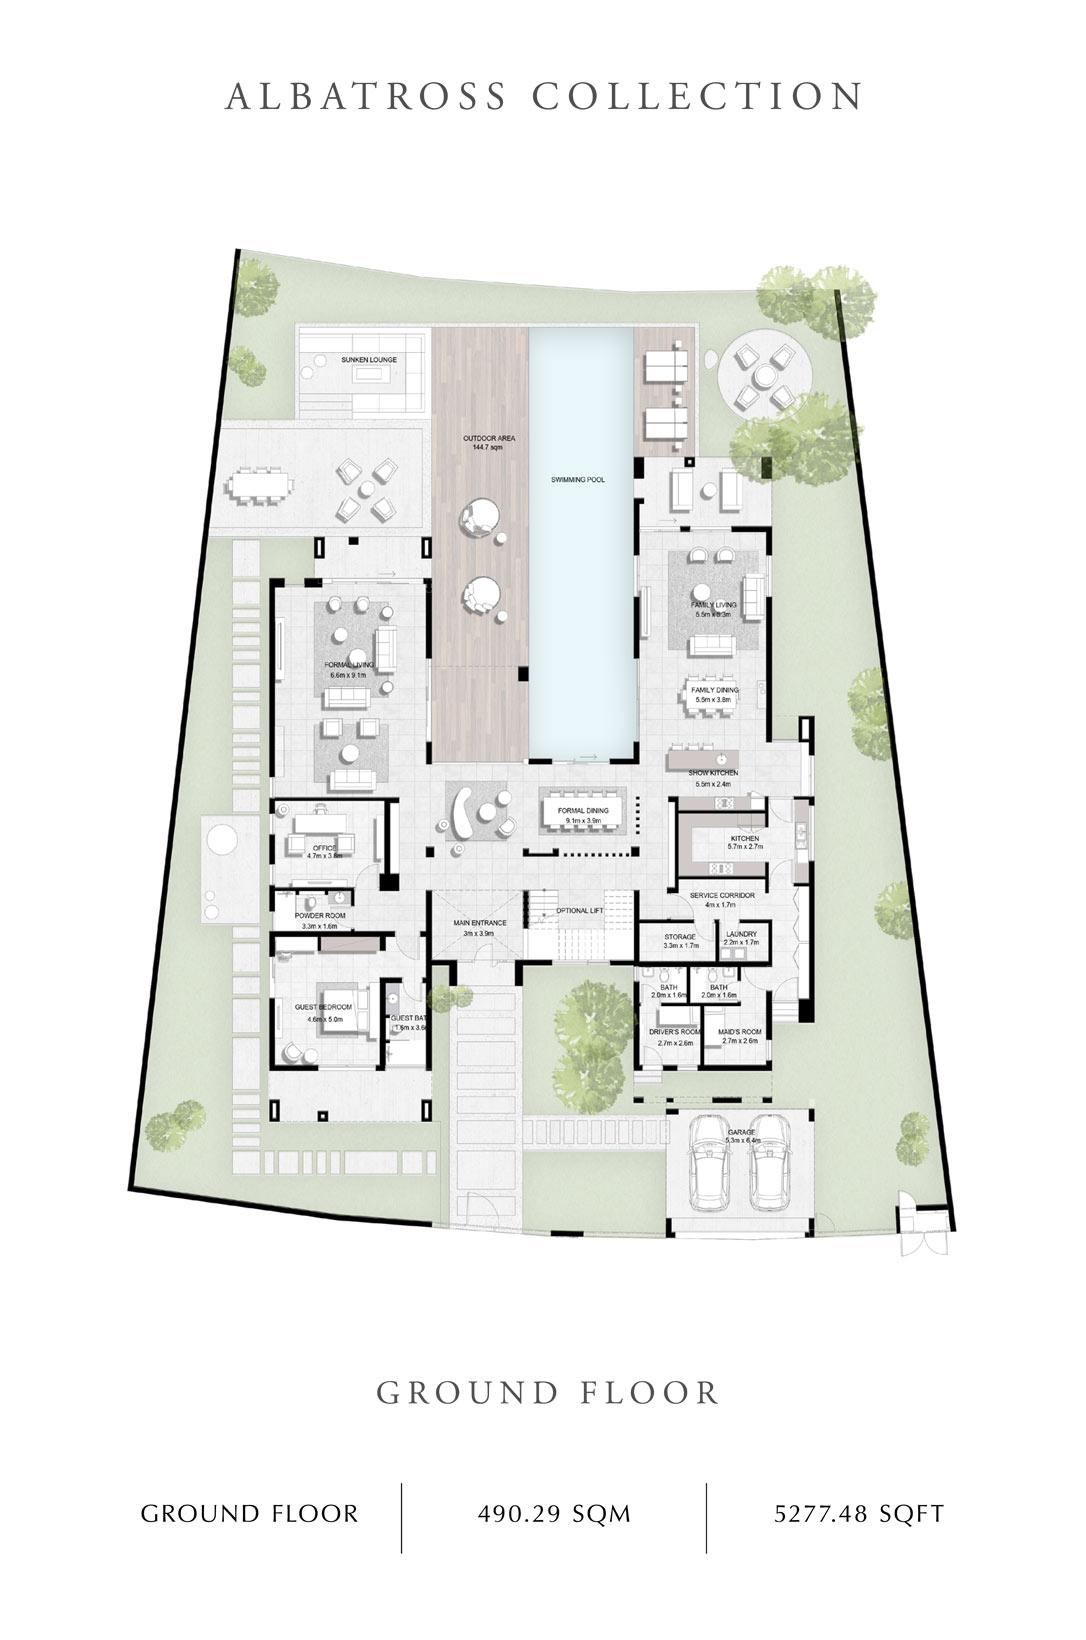 Albatross-Collection-Ground Floor- Size 5277 Sq Ft